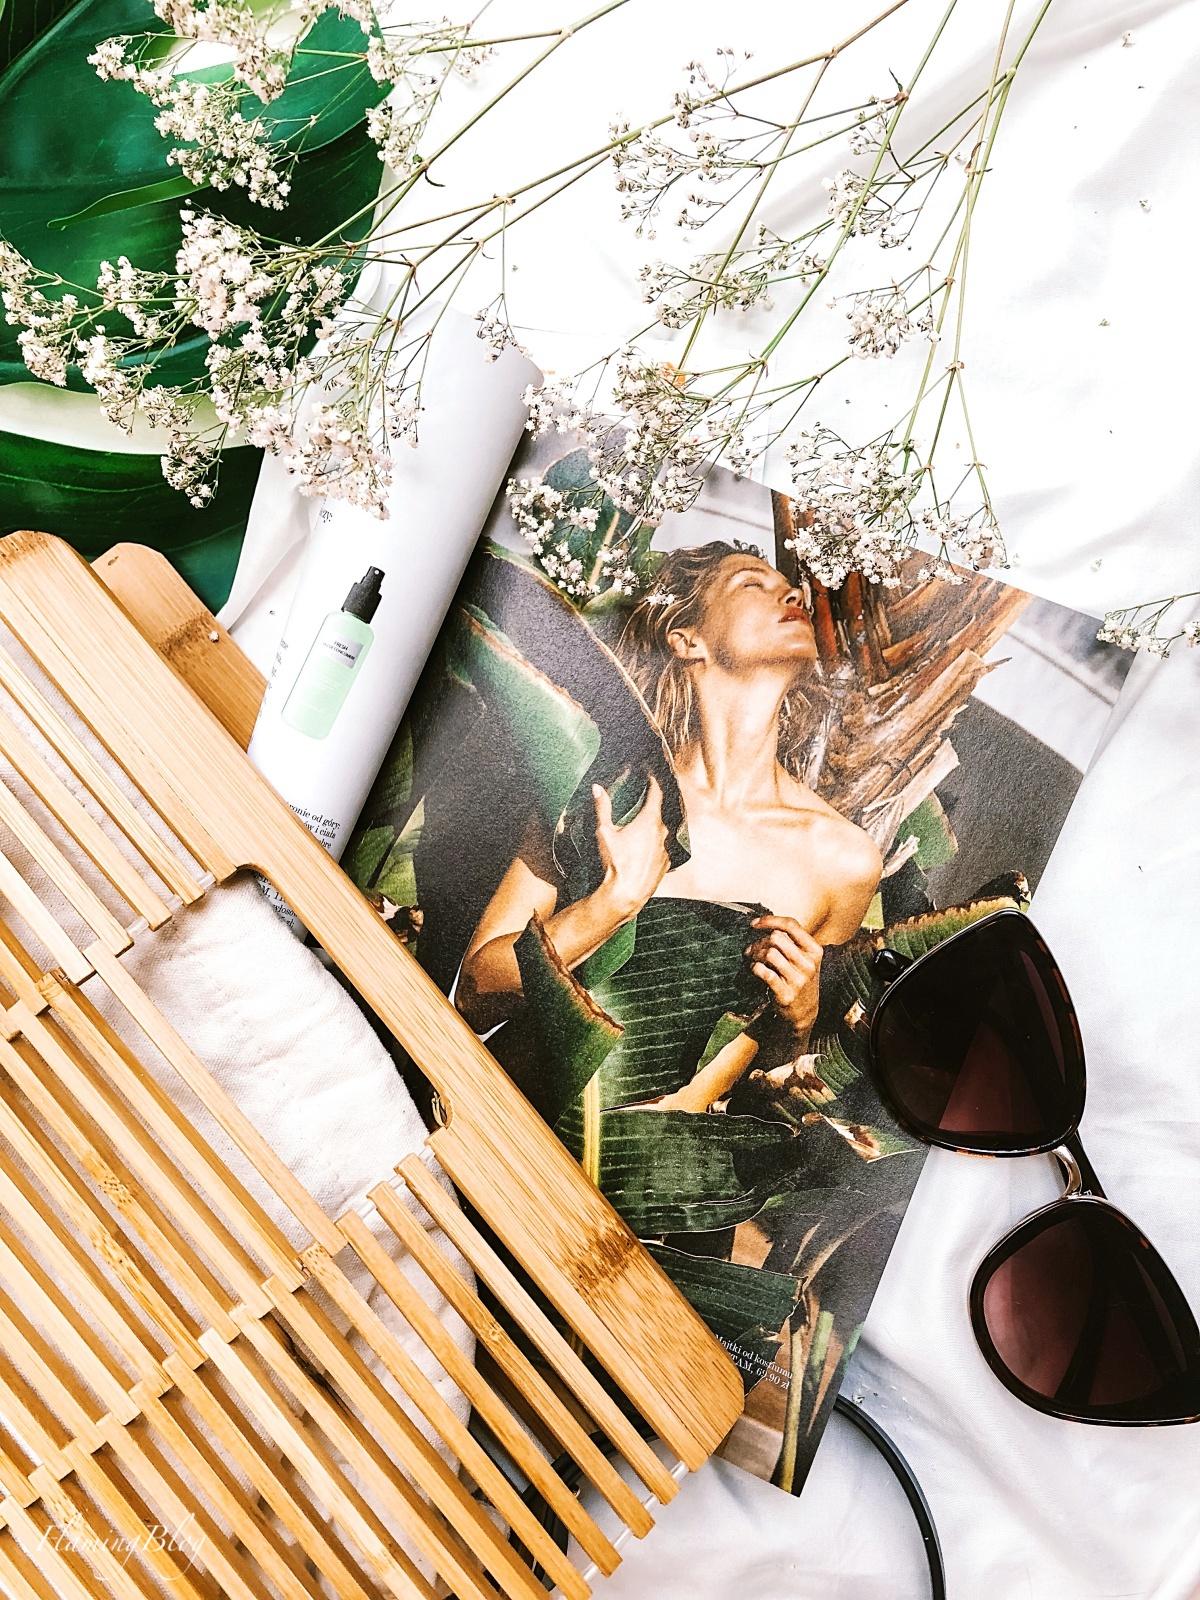 modne torebki kosze plecione worki trendy lato 2020